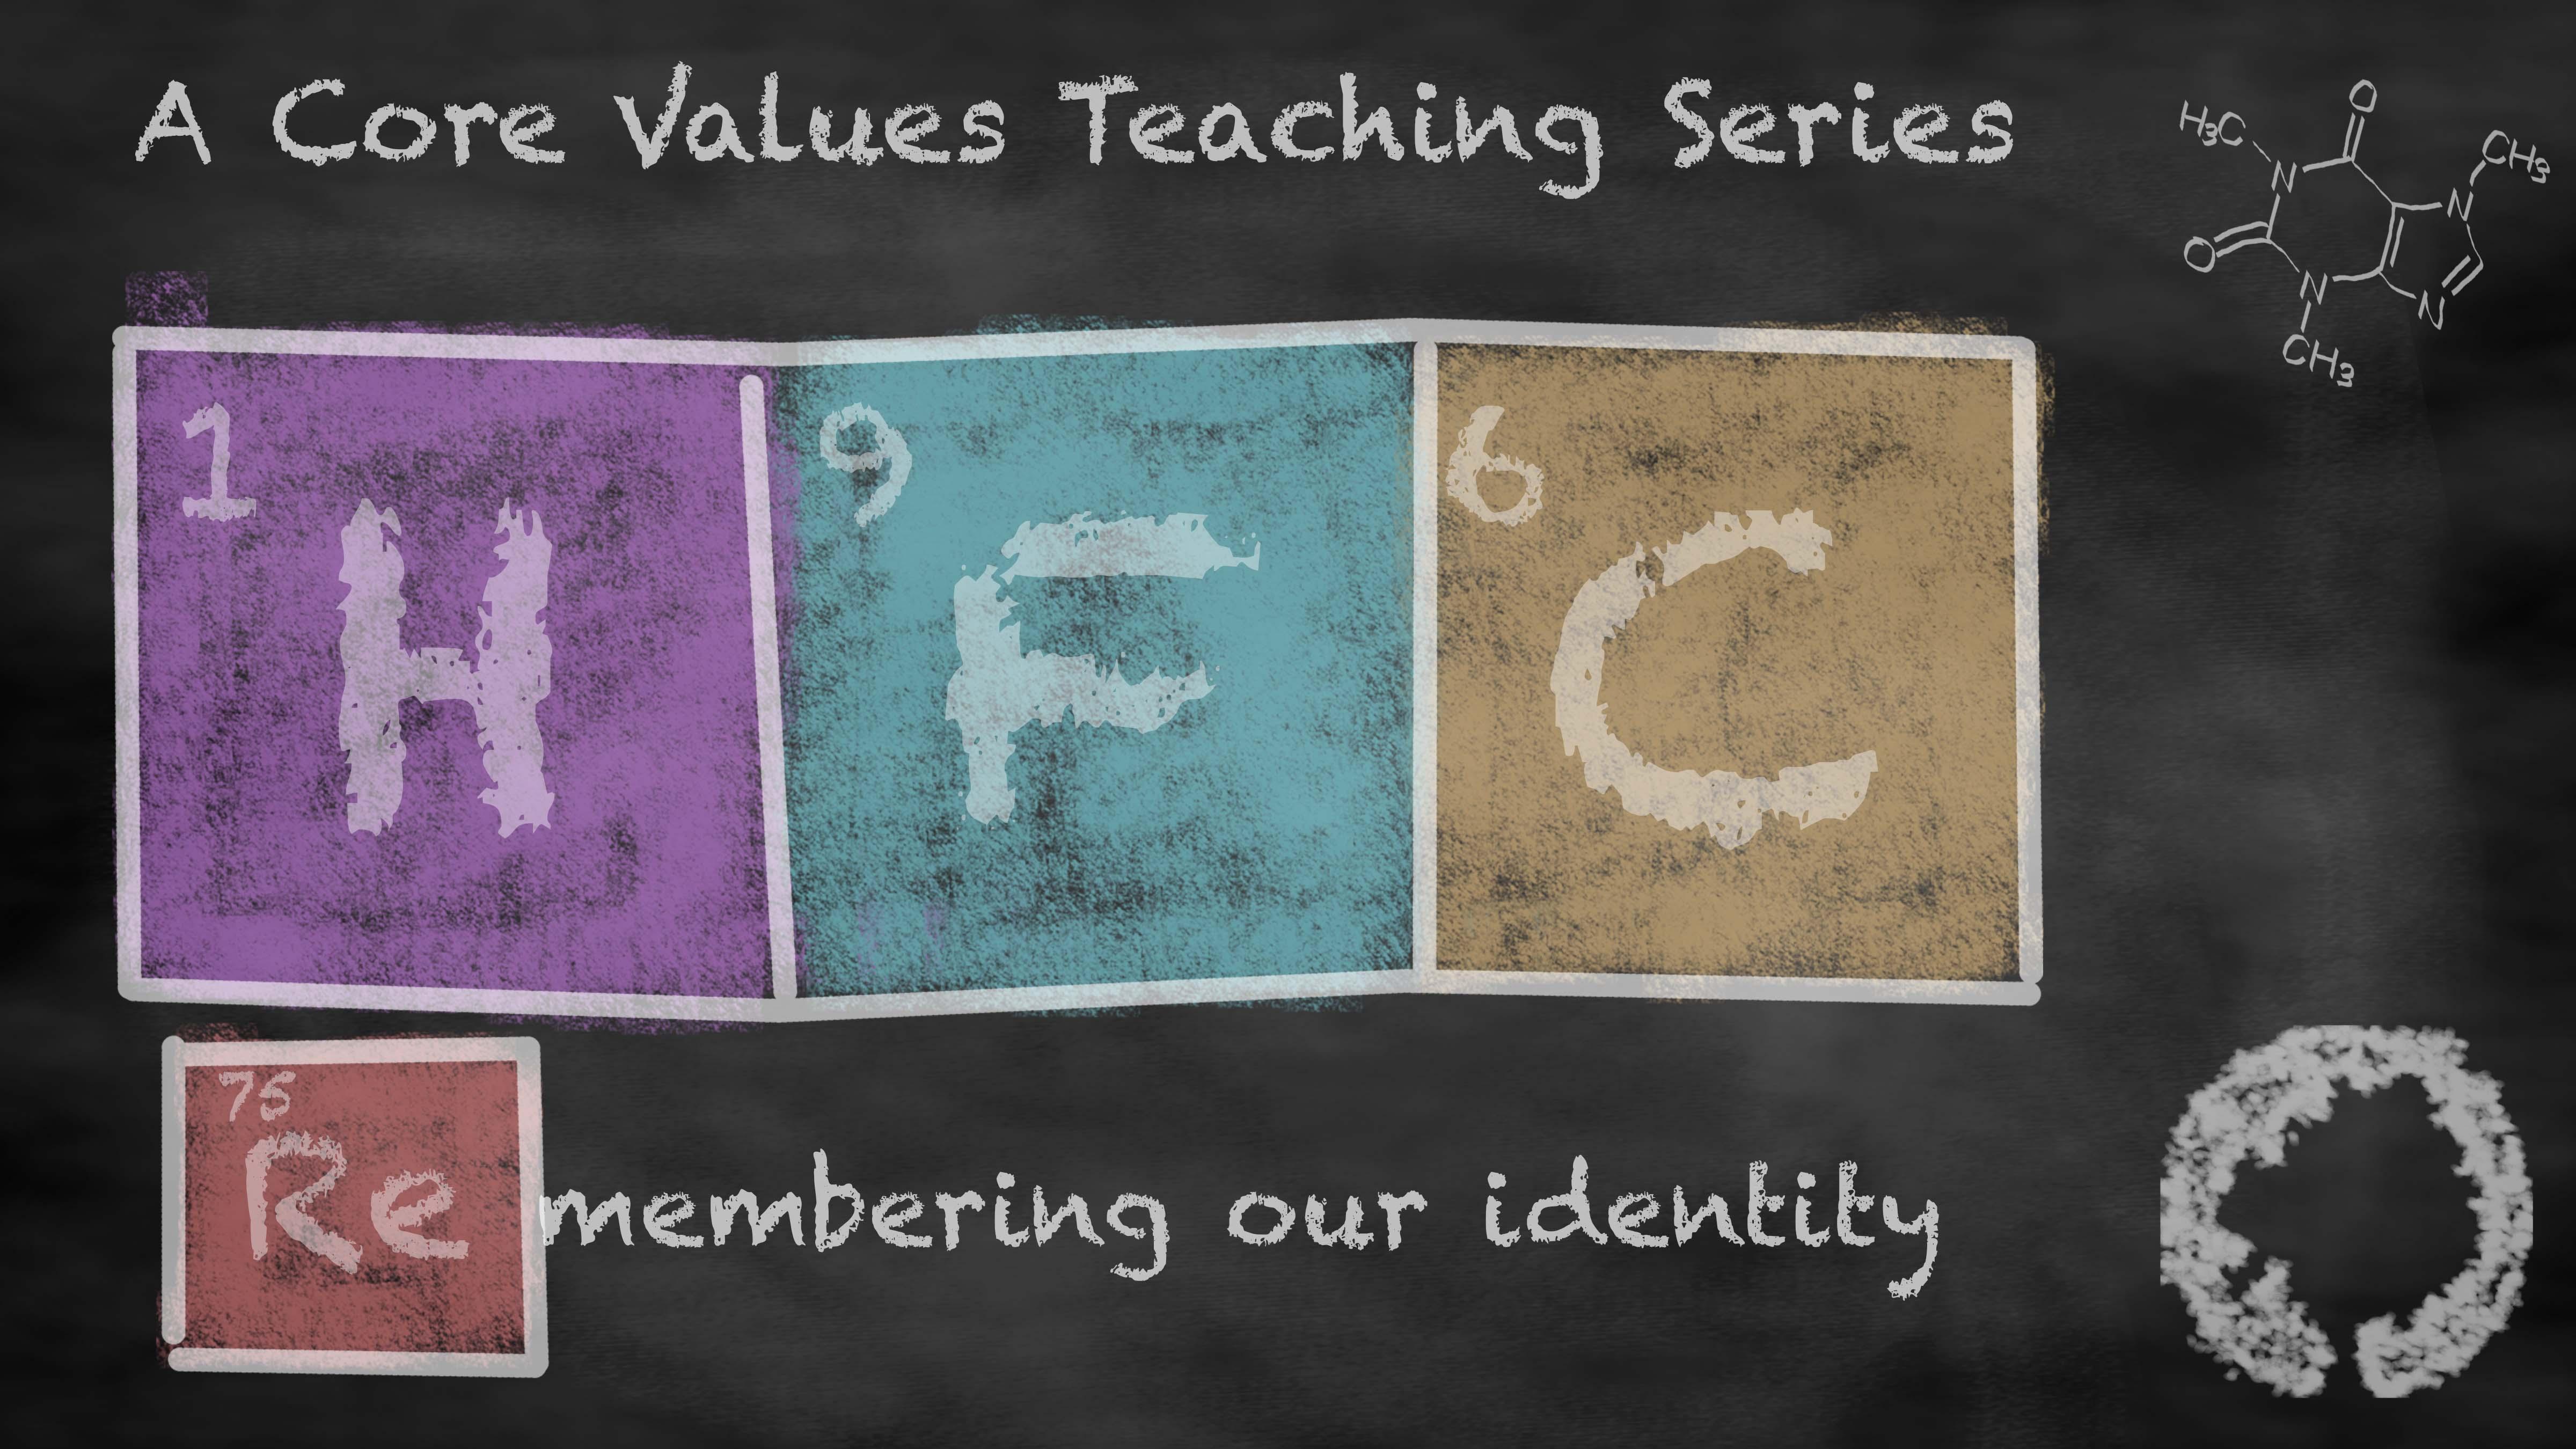 Current Teaching Series